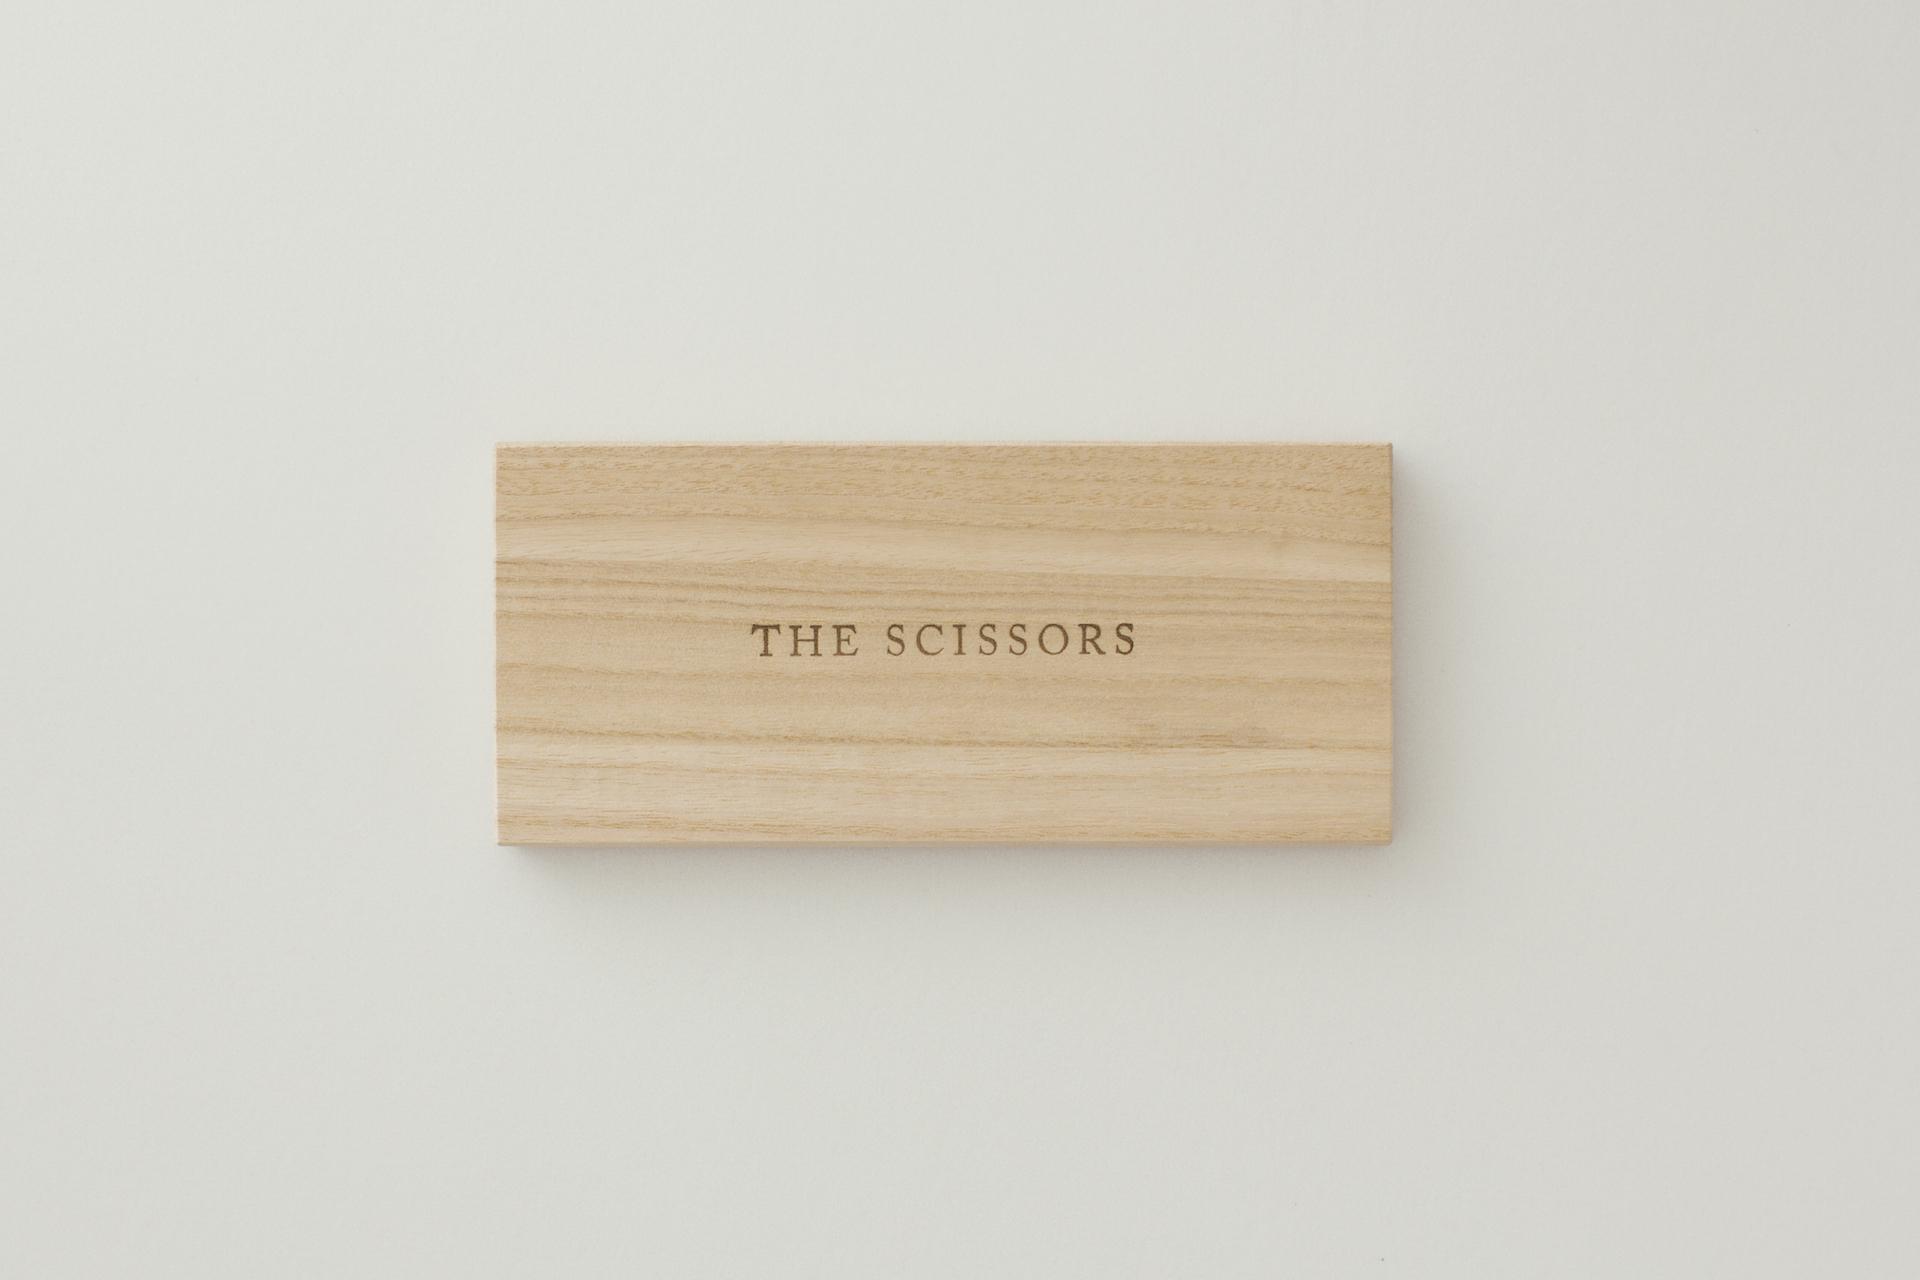 THE SCISSORS